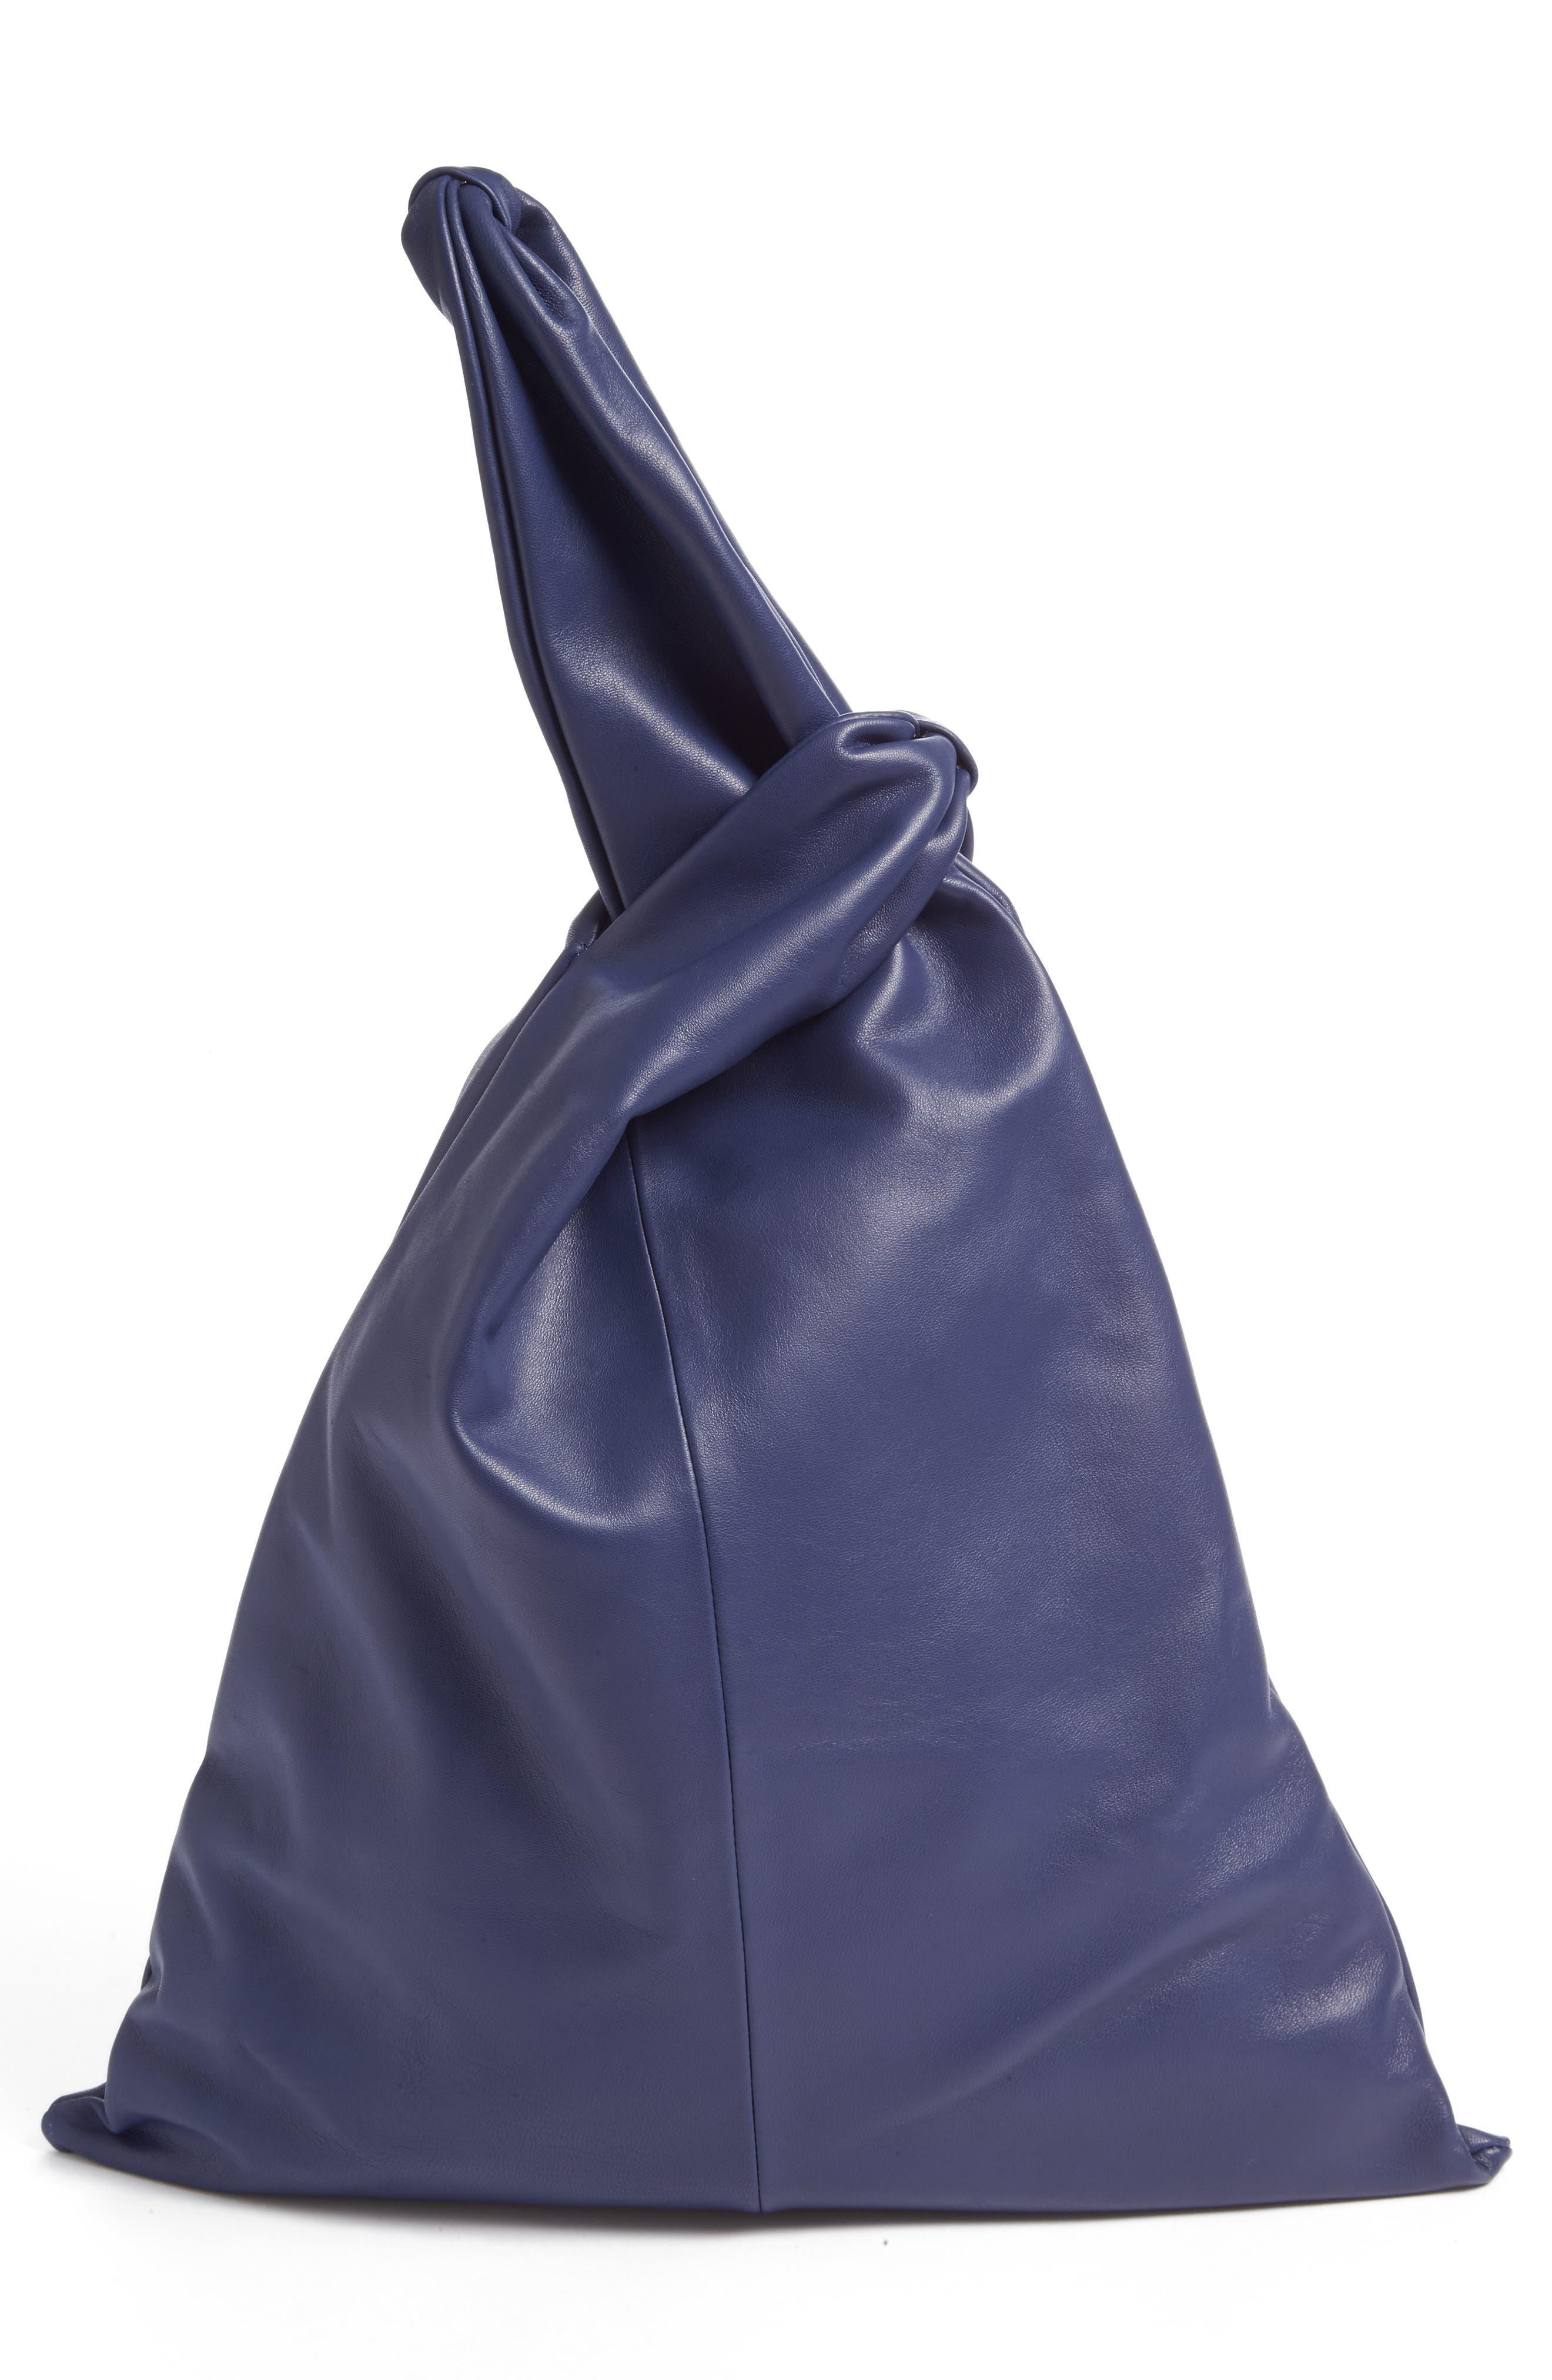 Alternate Image 1 Selected - Creatures of Comfort Large Nappa Leather Malia Bag